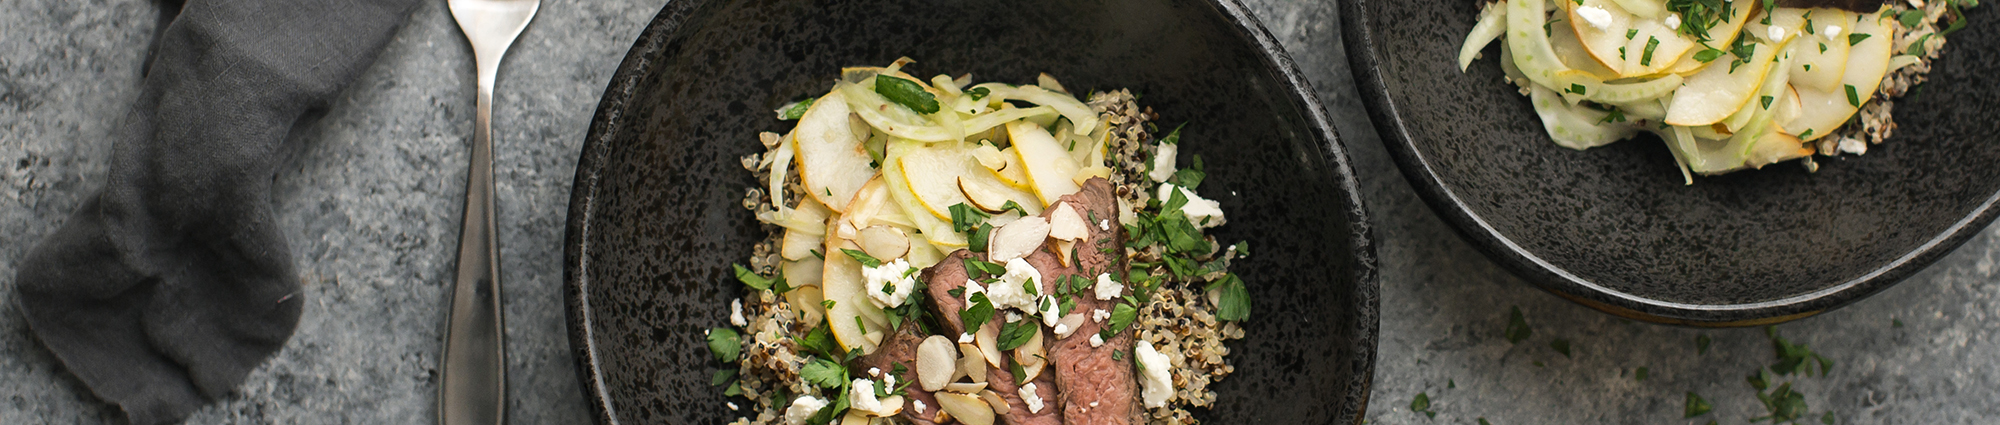 Bartlett pear quinoa steak bowl